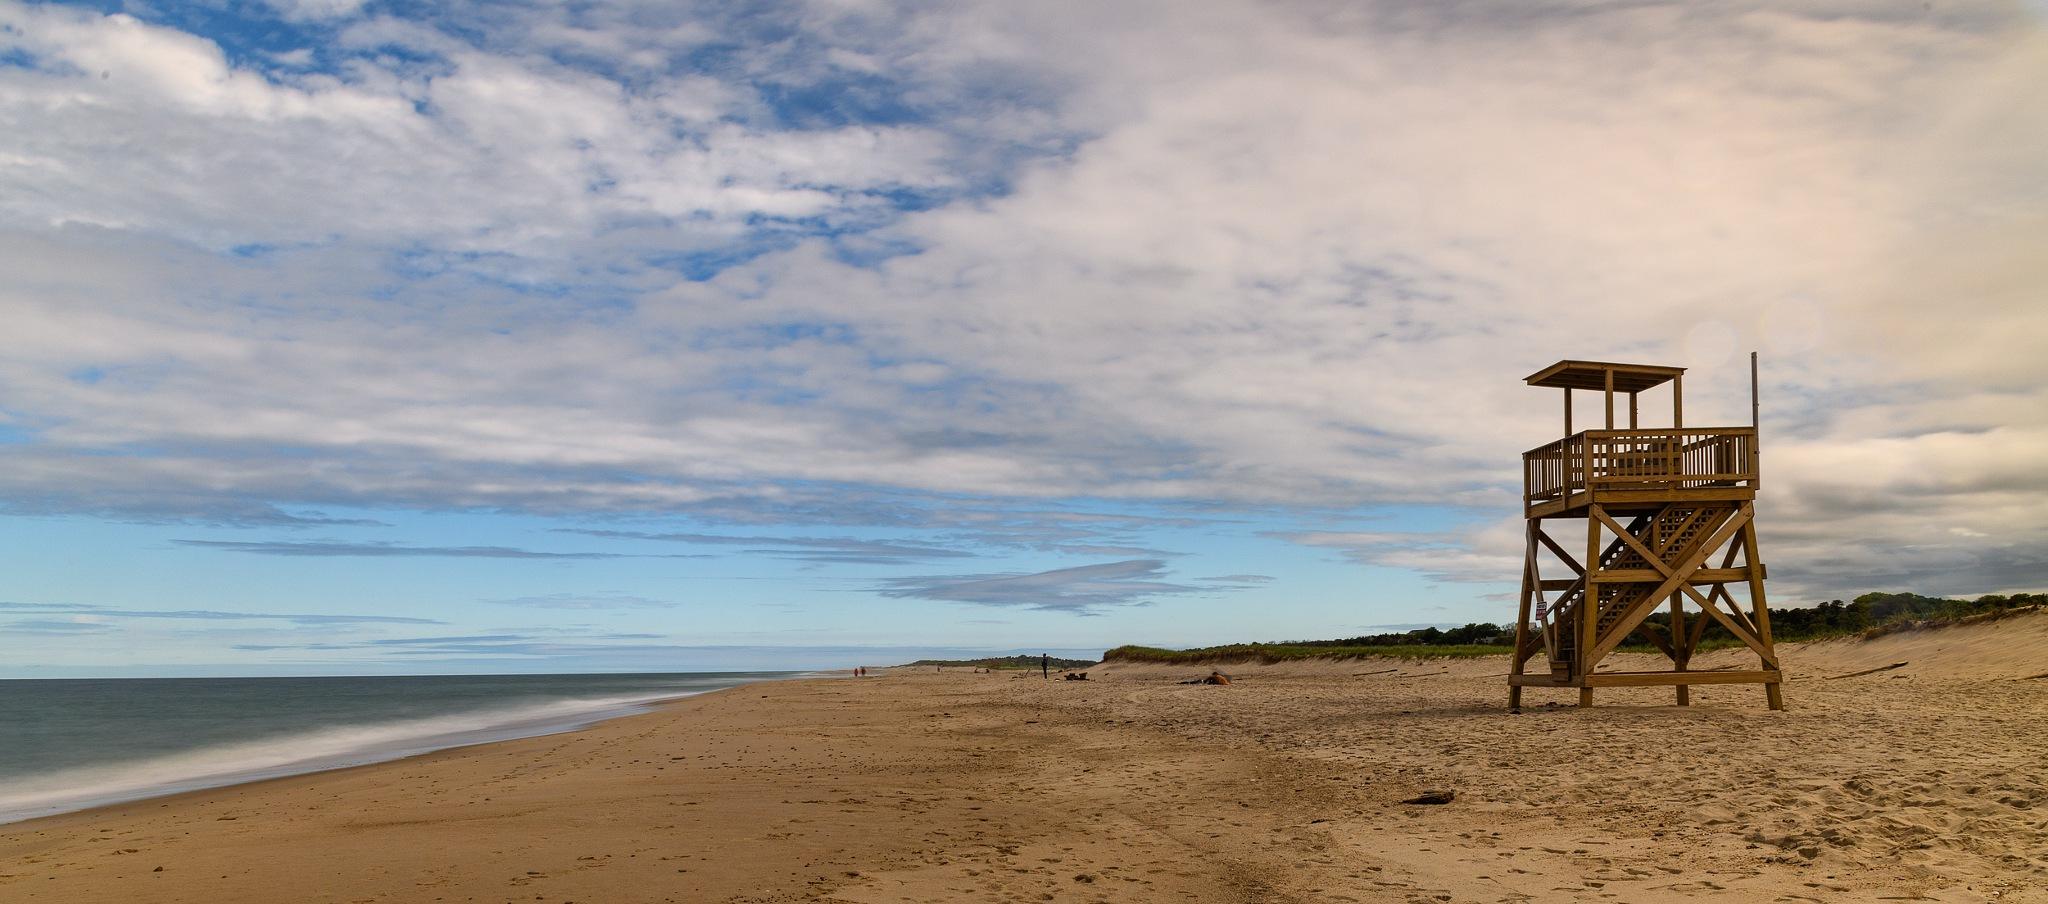 Beach Sentry by Steve Director